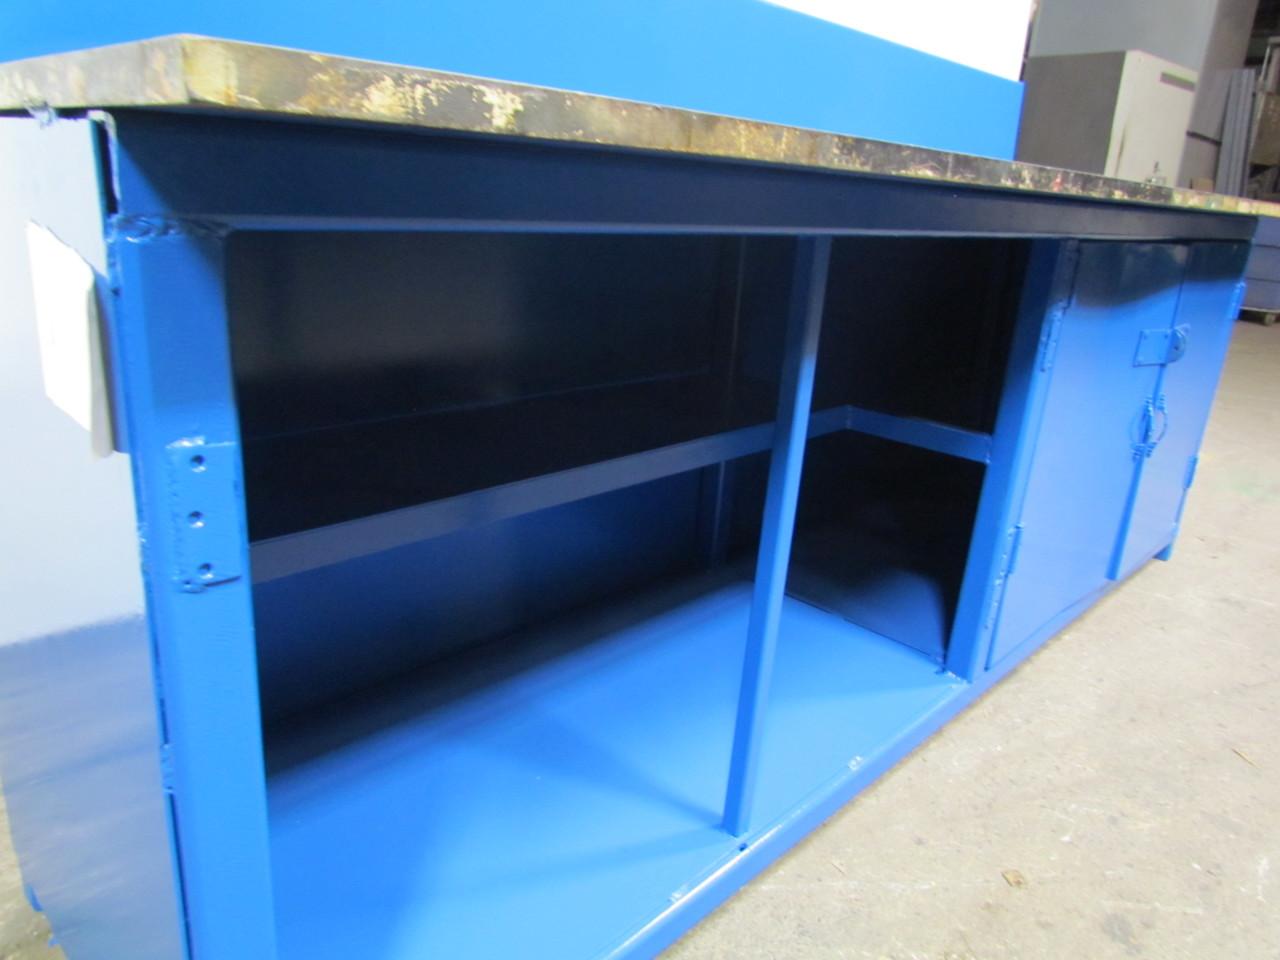 steel plate work weld bench w under shelf storage 1 thick. Black Bedroom Furniture Sets. Home Design Ideas